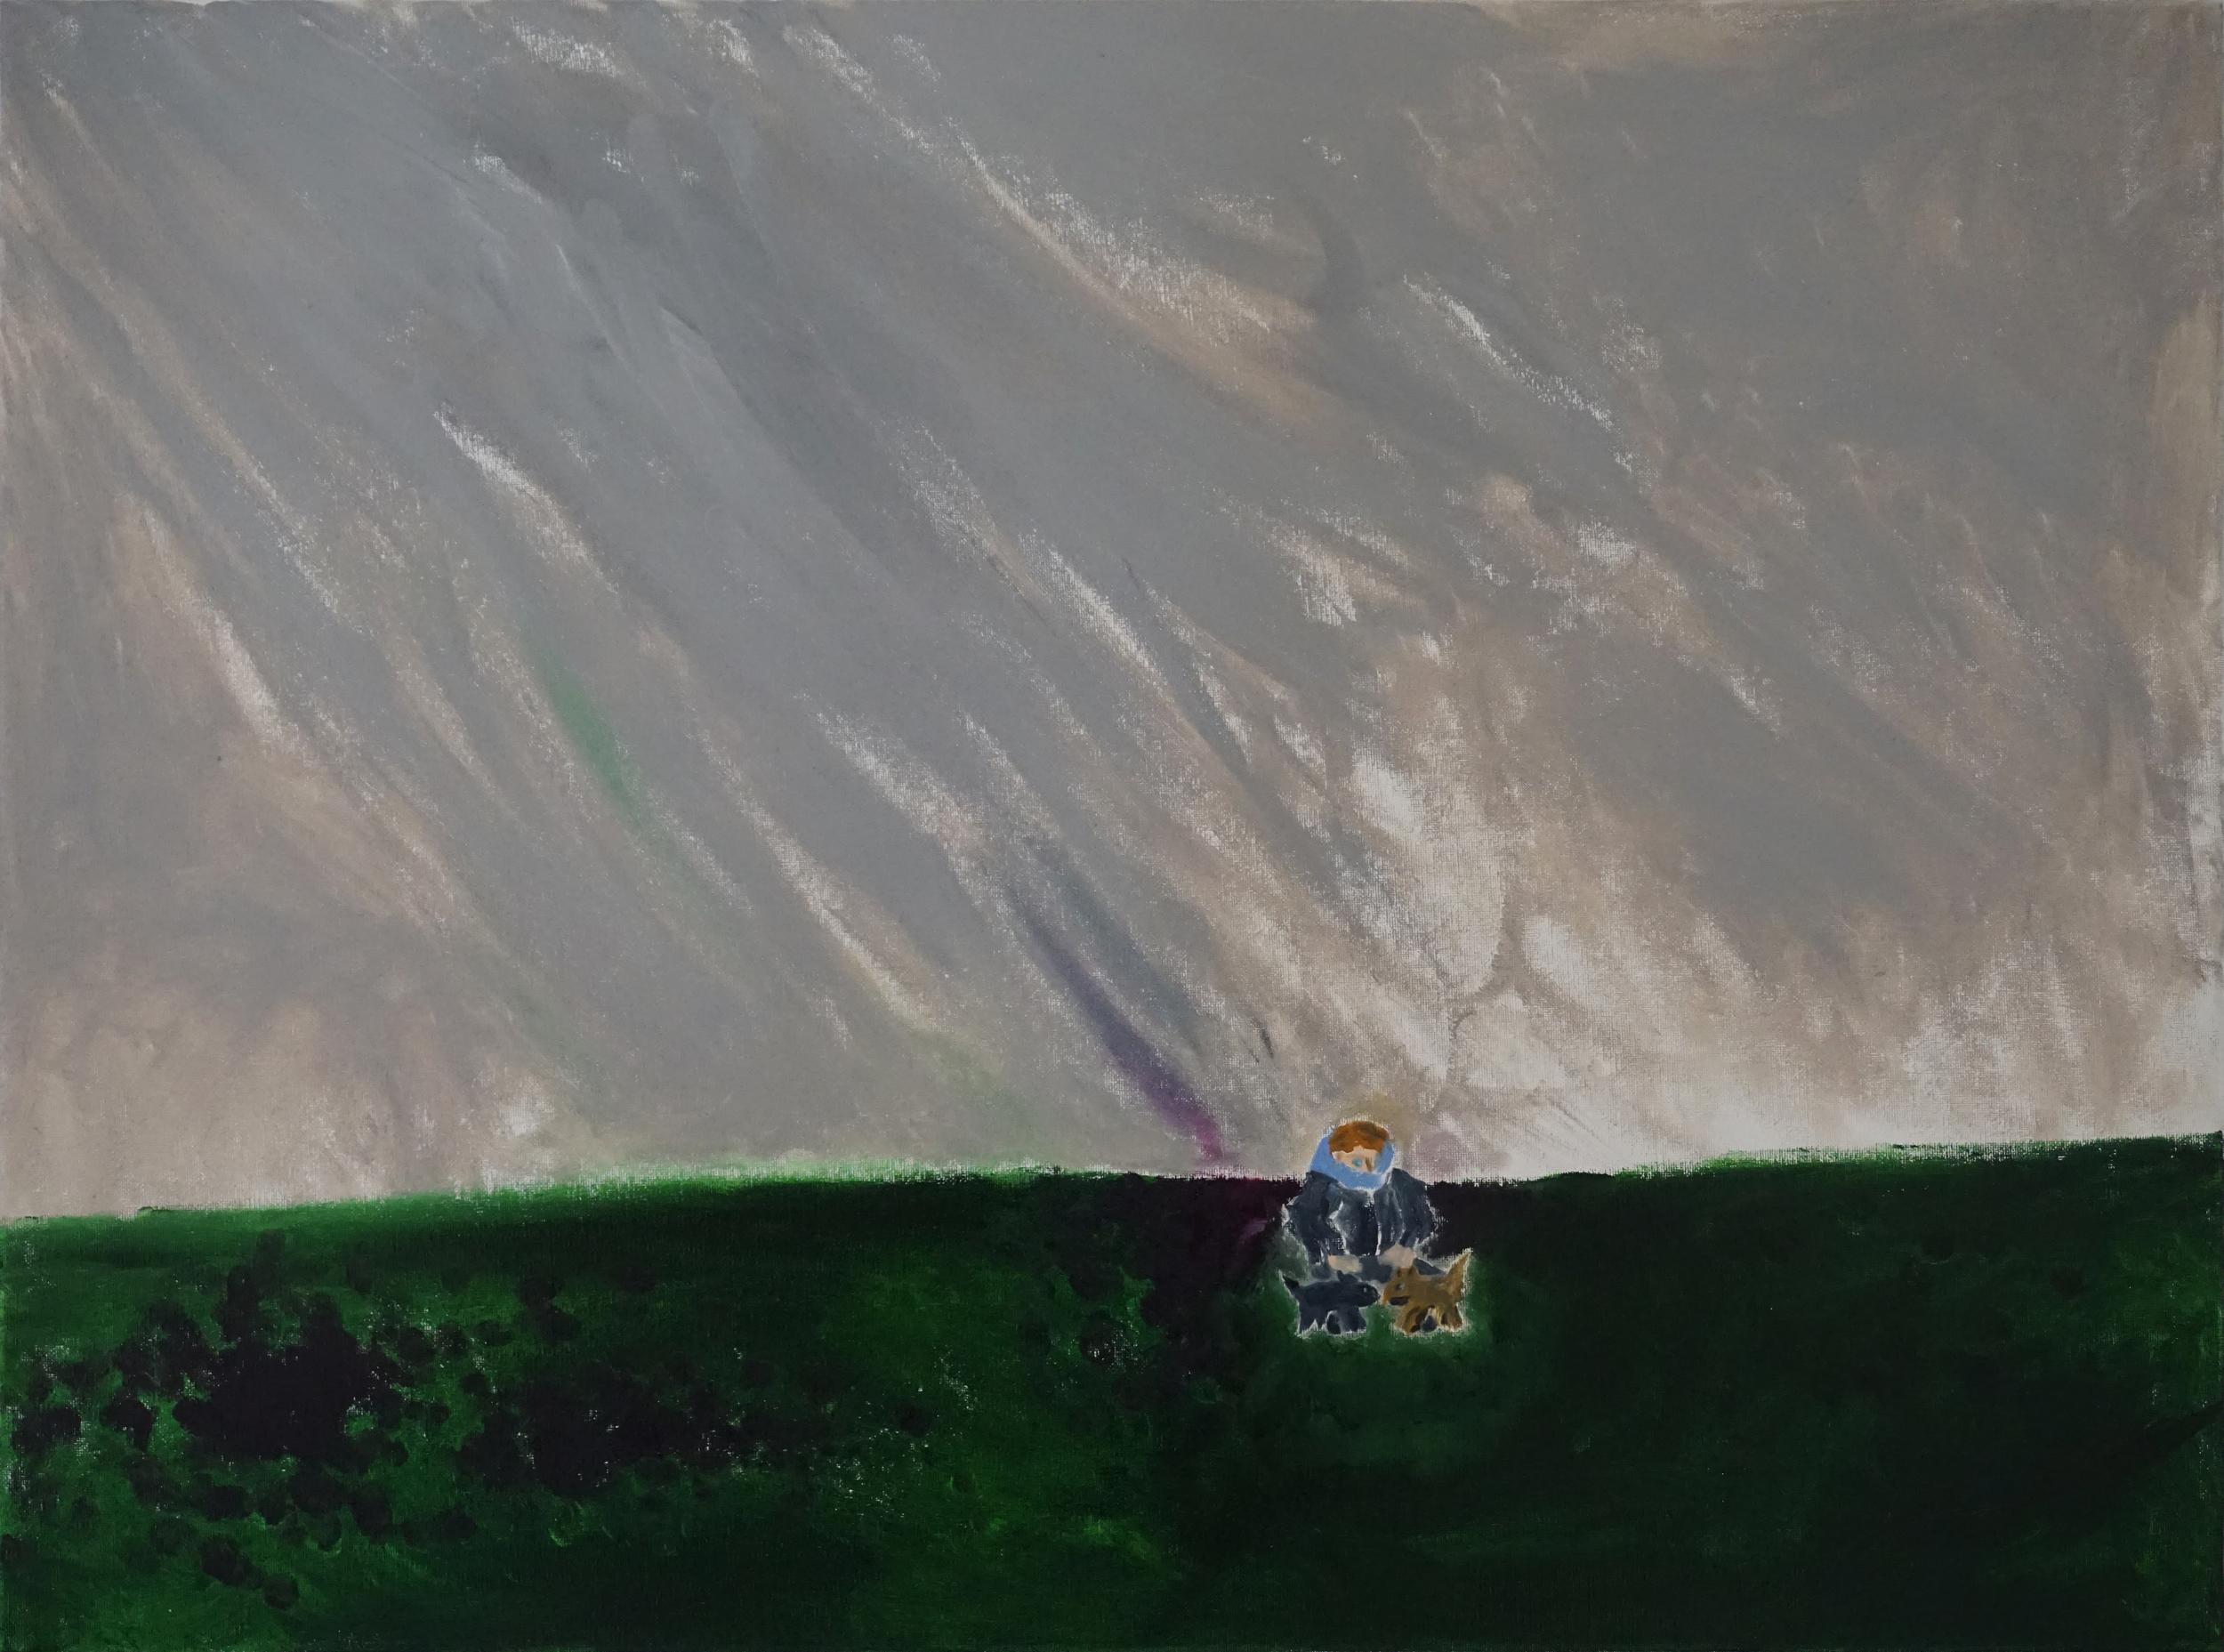 JESSE WAUGH   HAILSTORM ON POMPY HILL   2016 OIL ON CANVAS